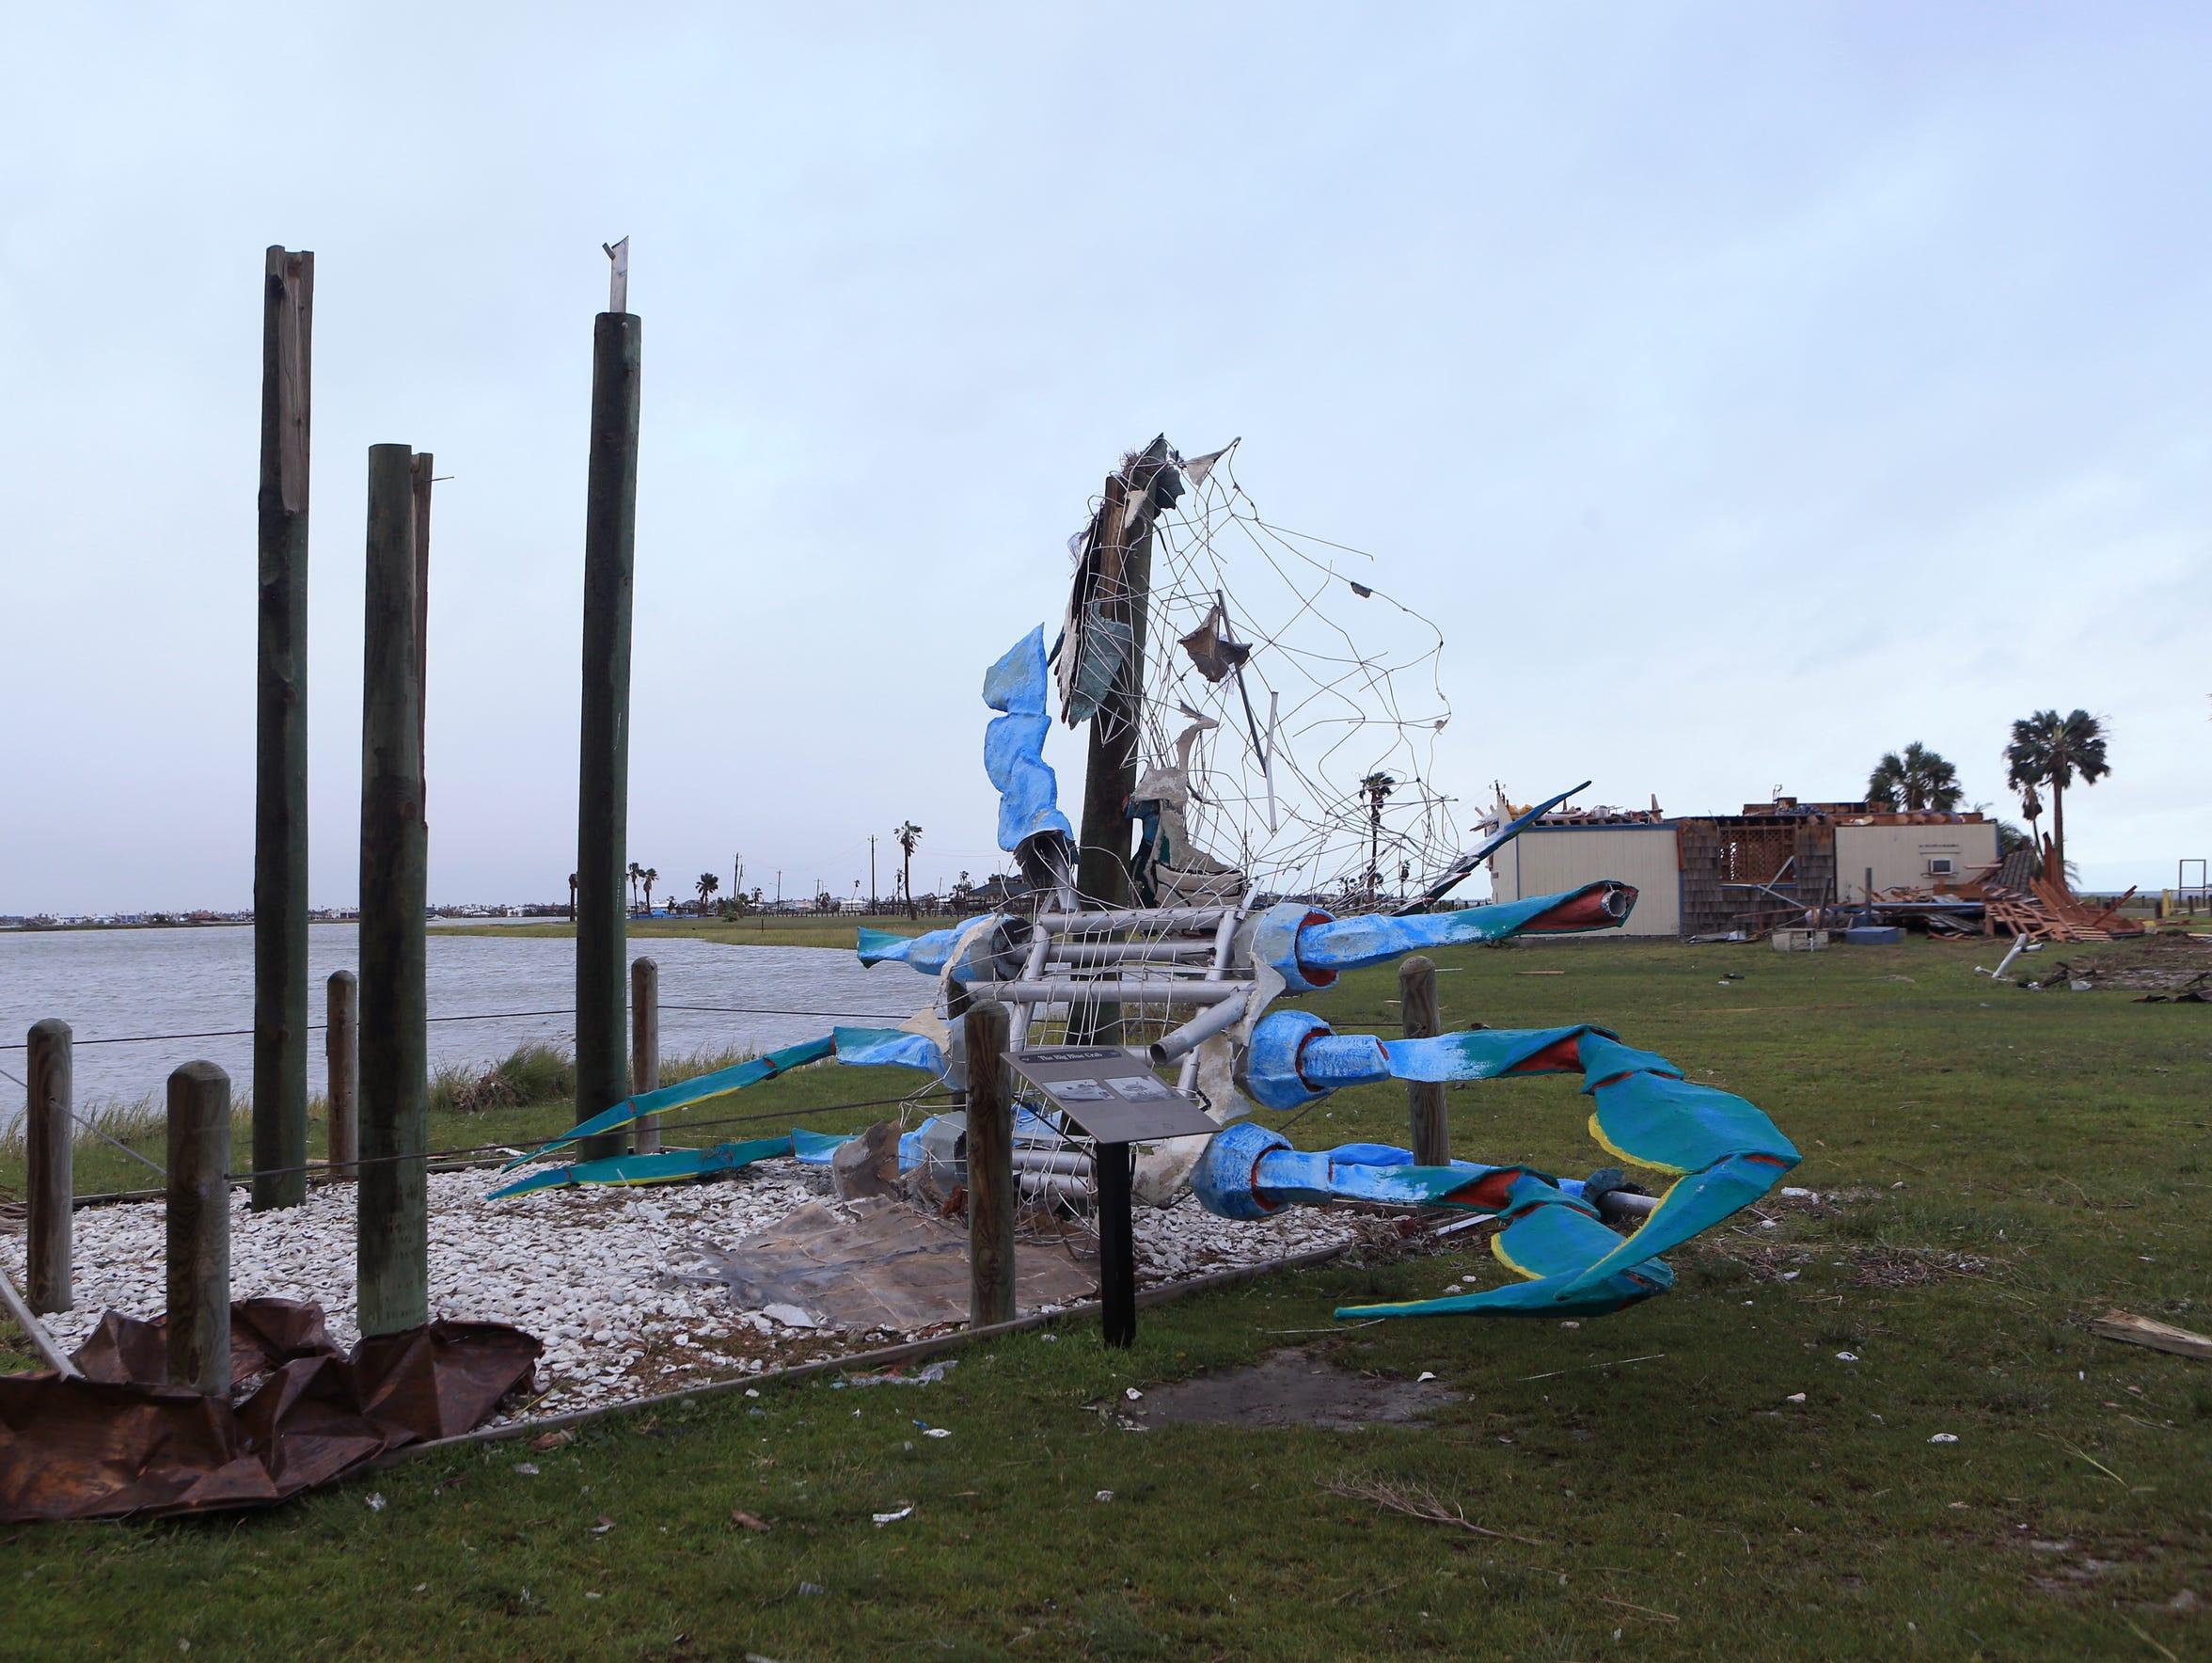 Rockport's iconic landmark, the Blue Crab, was knocked